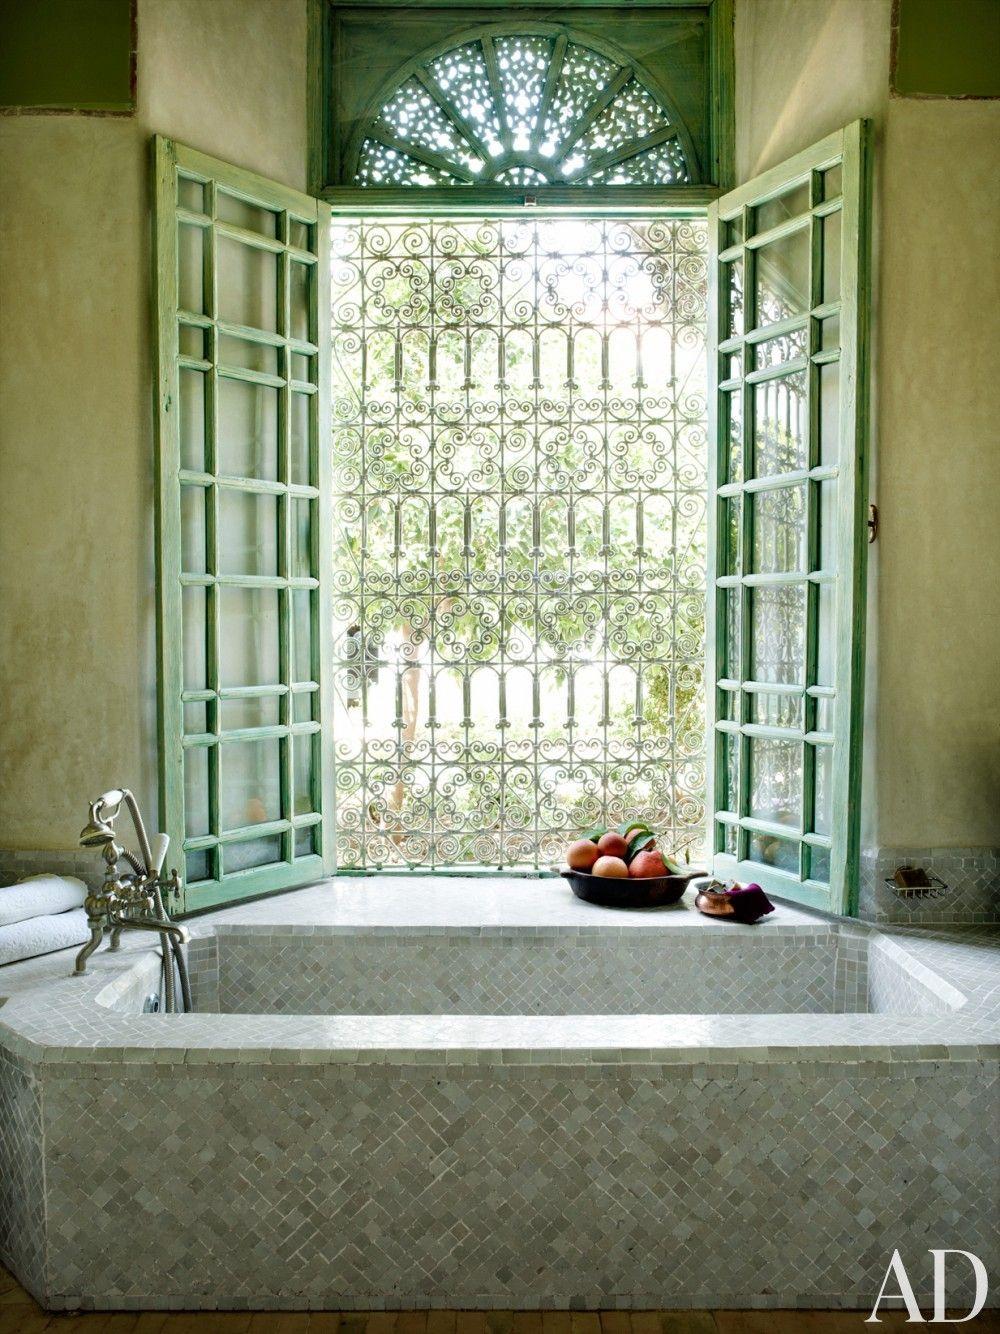 Vous Avez Envie Dune Salle De Bain Bleue Vert Inspirée Des - Envie de salle de bain